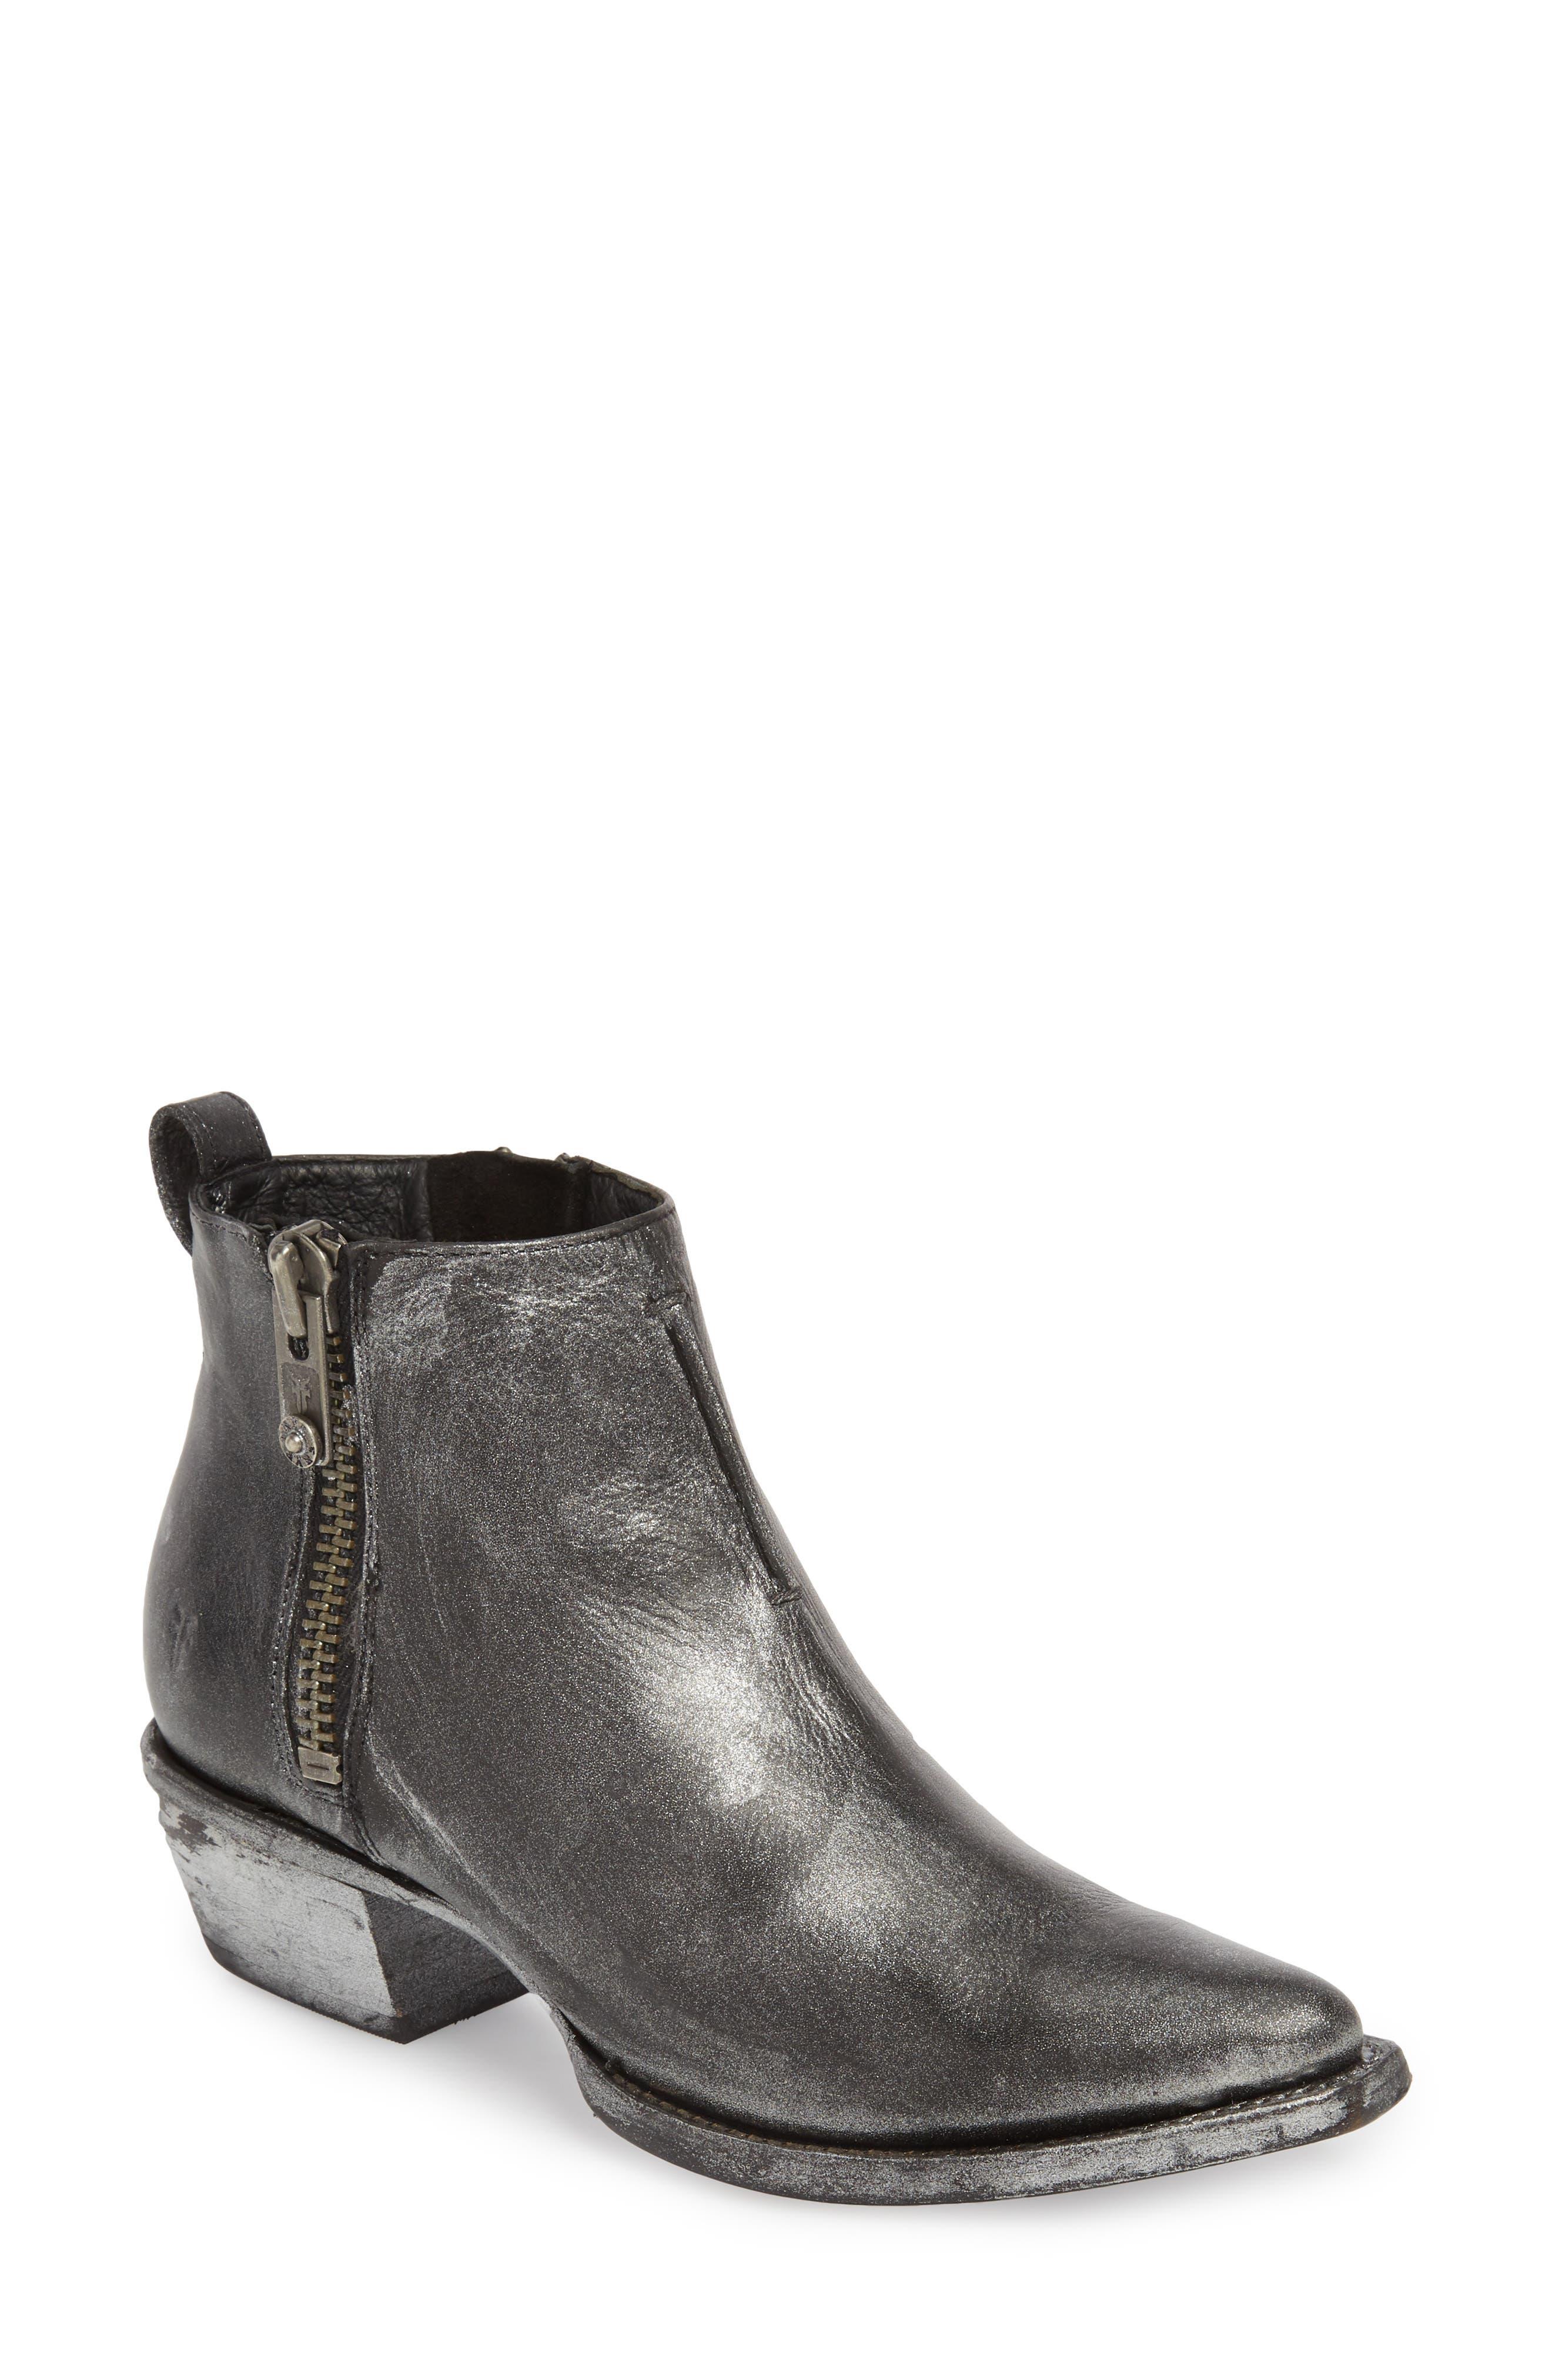 Sacha Moto Short Bootie,                         Main,                         color, Black Metallic Leather